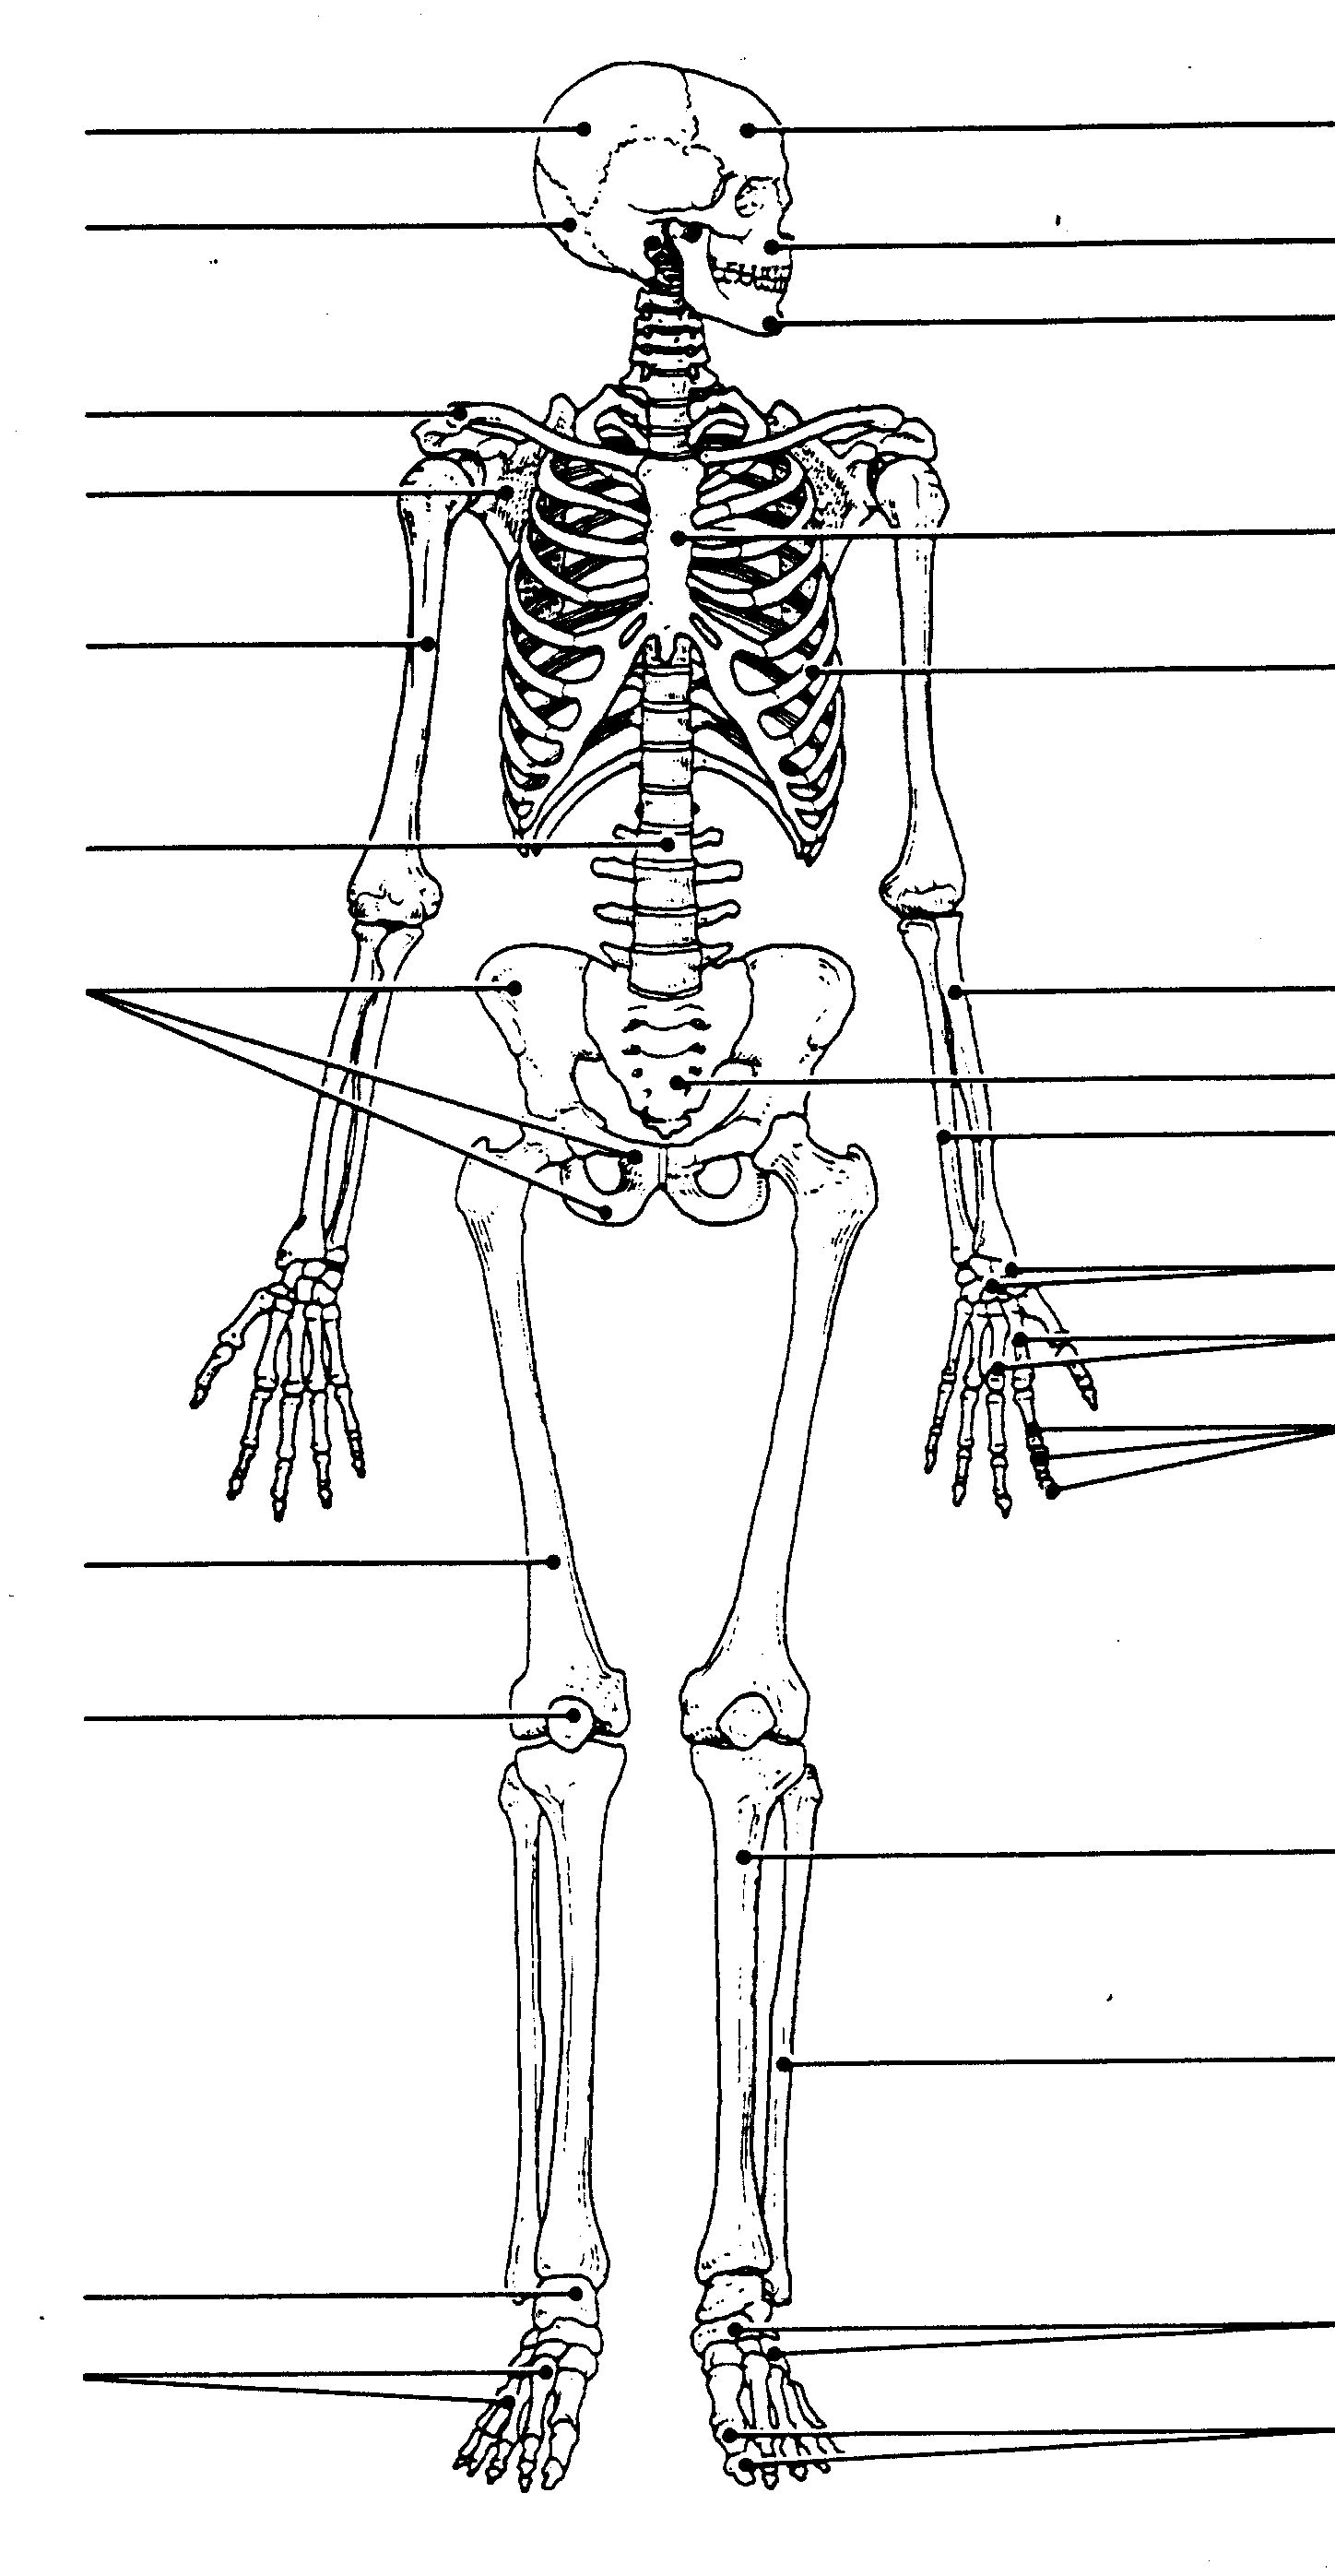 medium resolution of unlabeled human skeleton diagram unlabeled human skeleton diagram blank human skeleton diagram unlabeled human skeleton